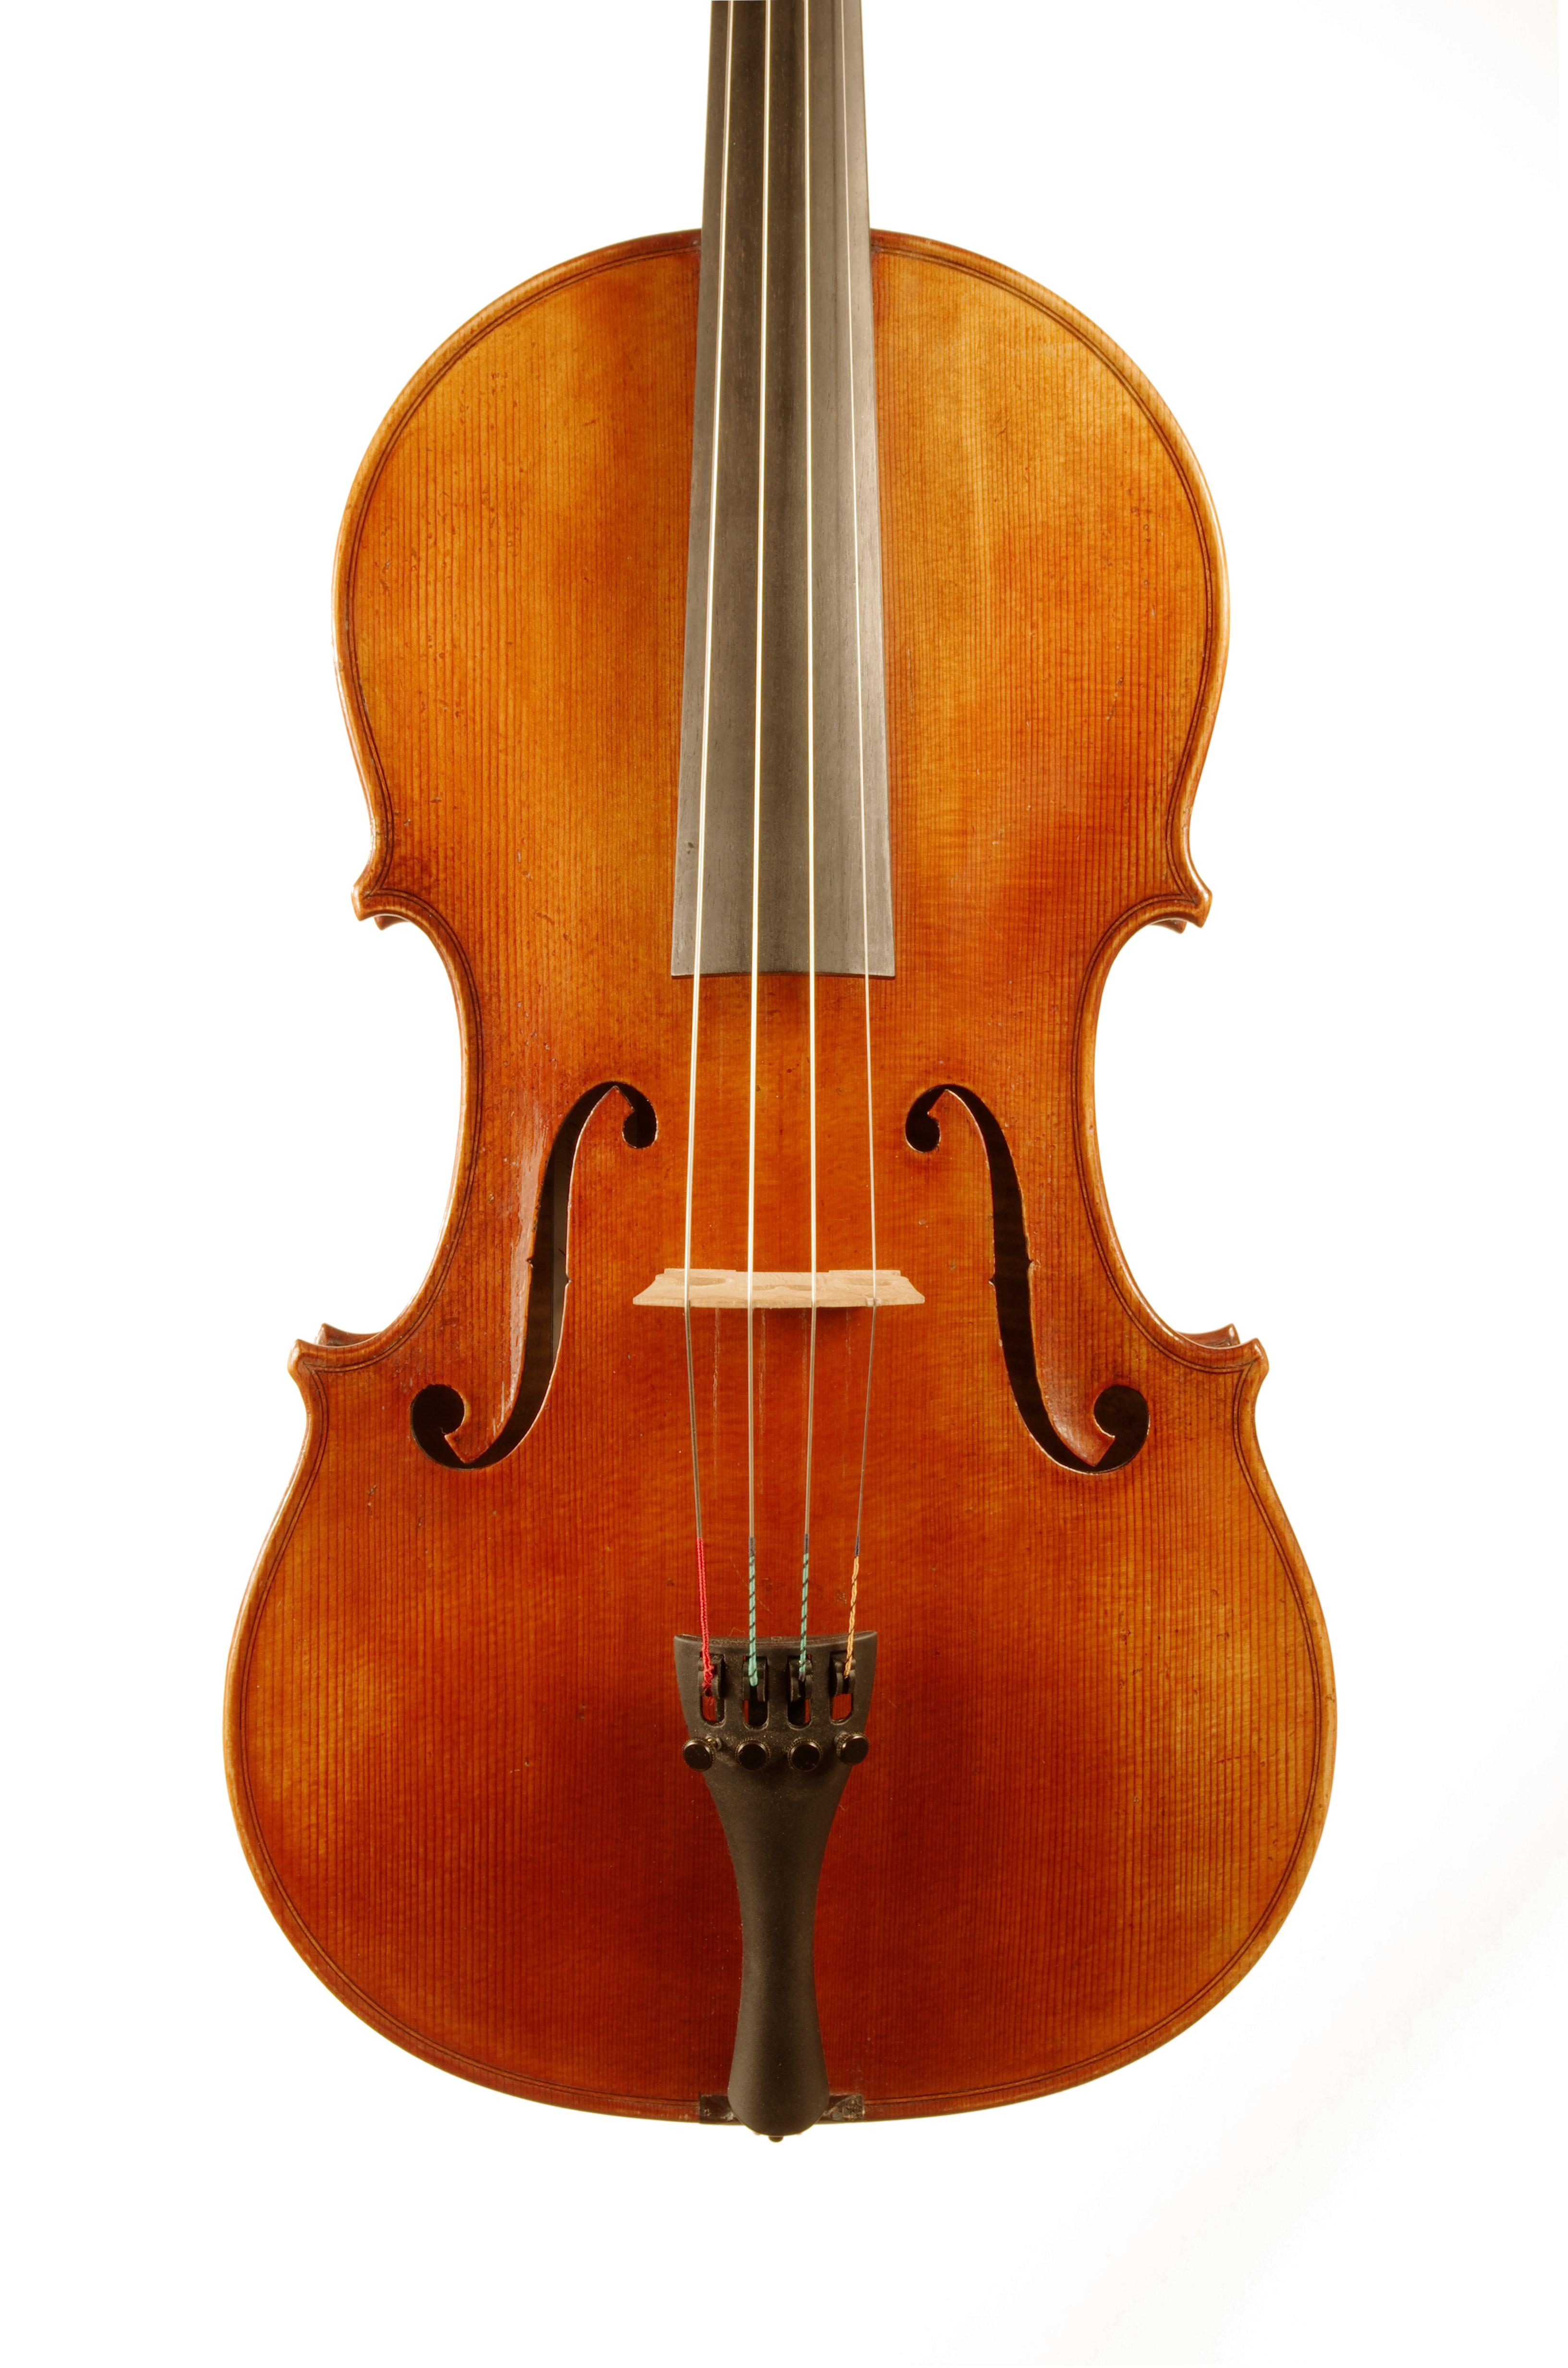 Petit Alto - Luthier Benjamin Beugnies